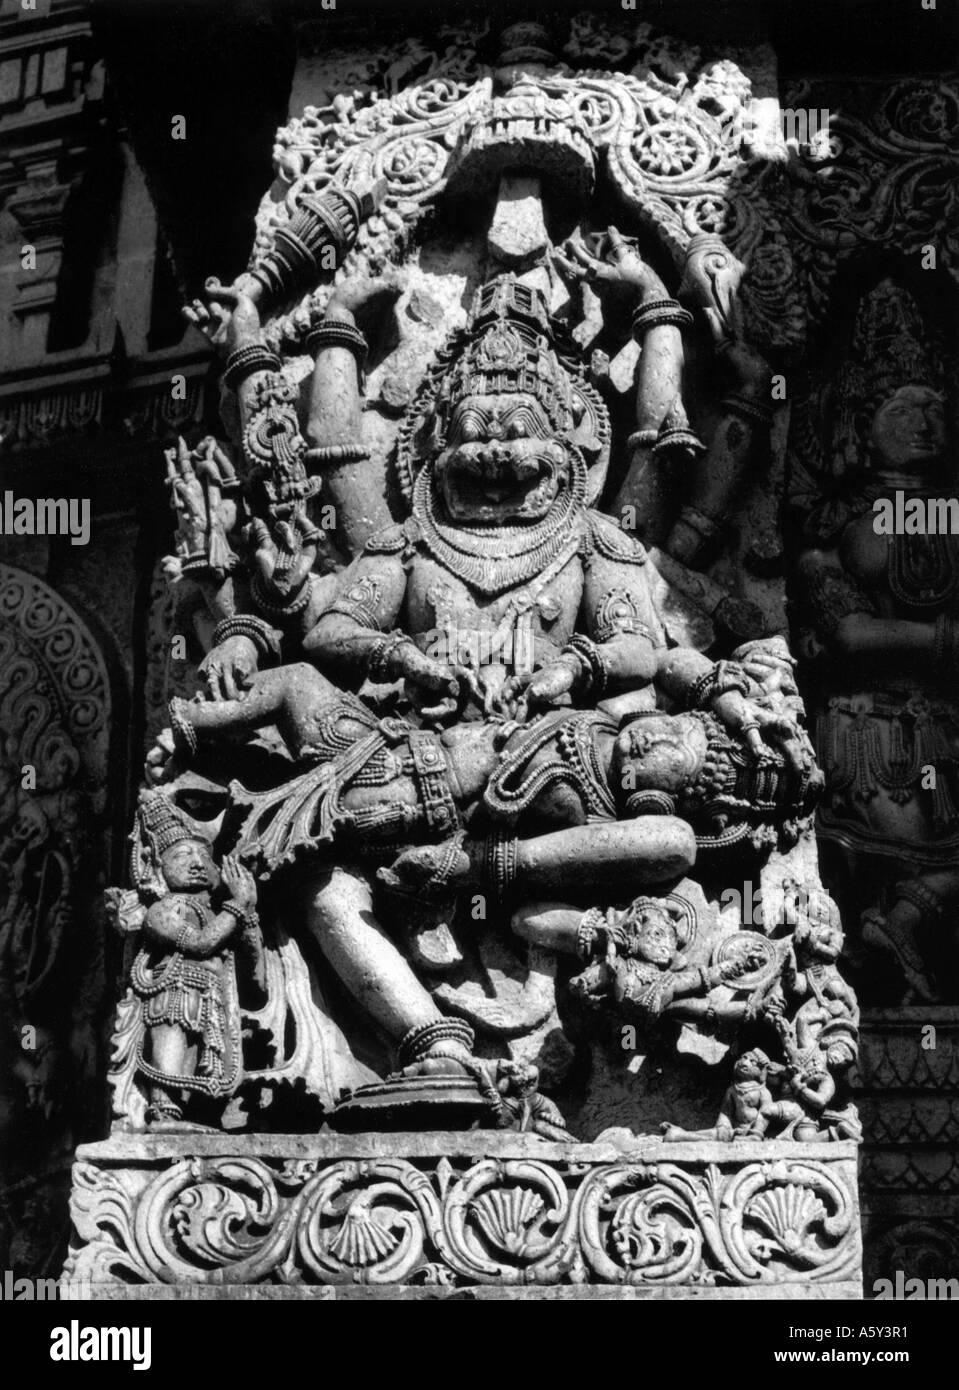 Stone sculpture of Narasimha India - Stock Image